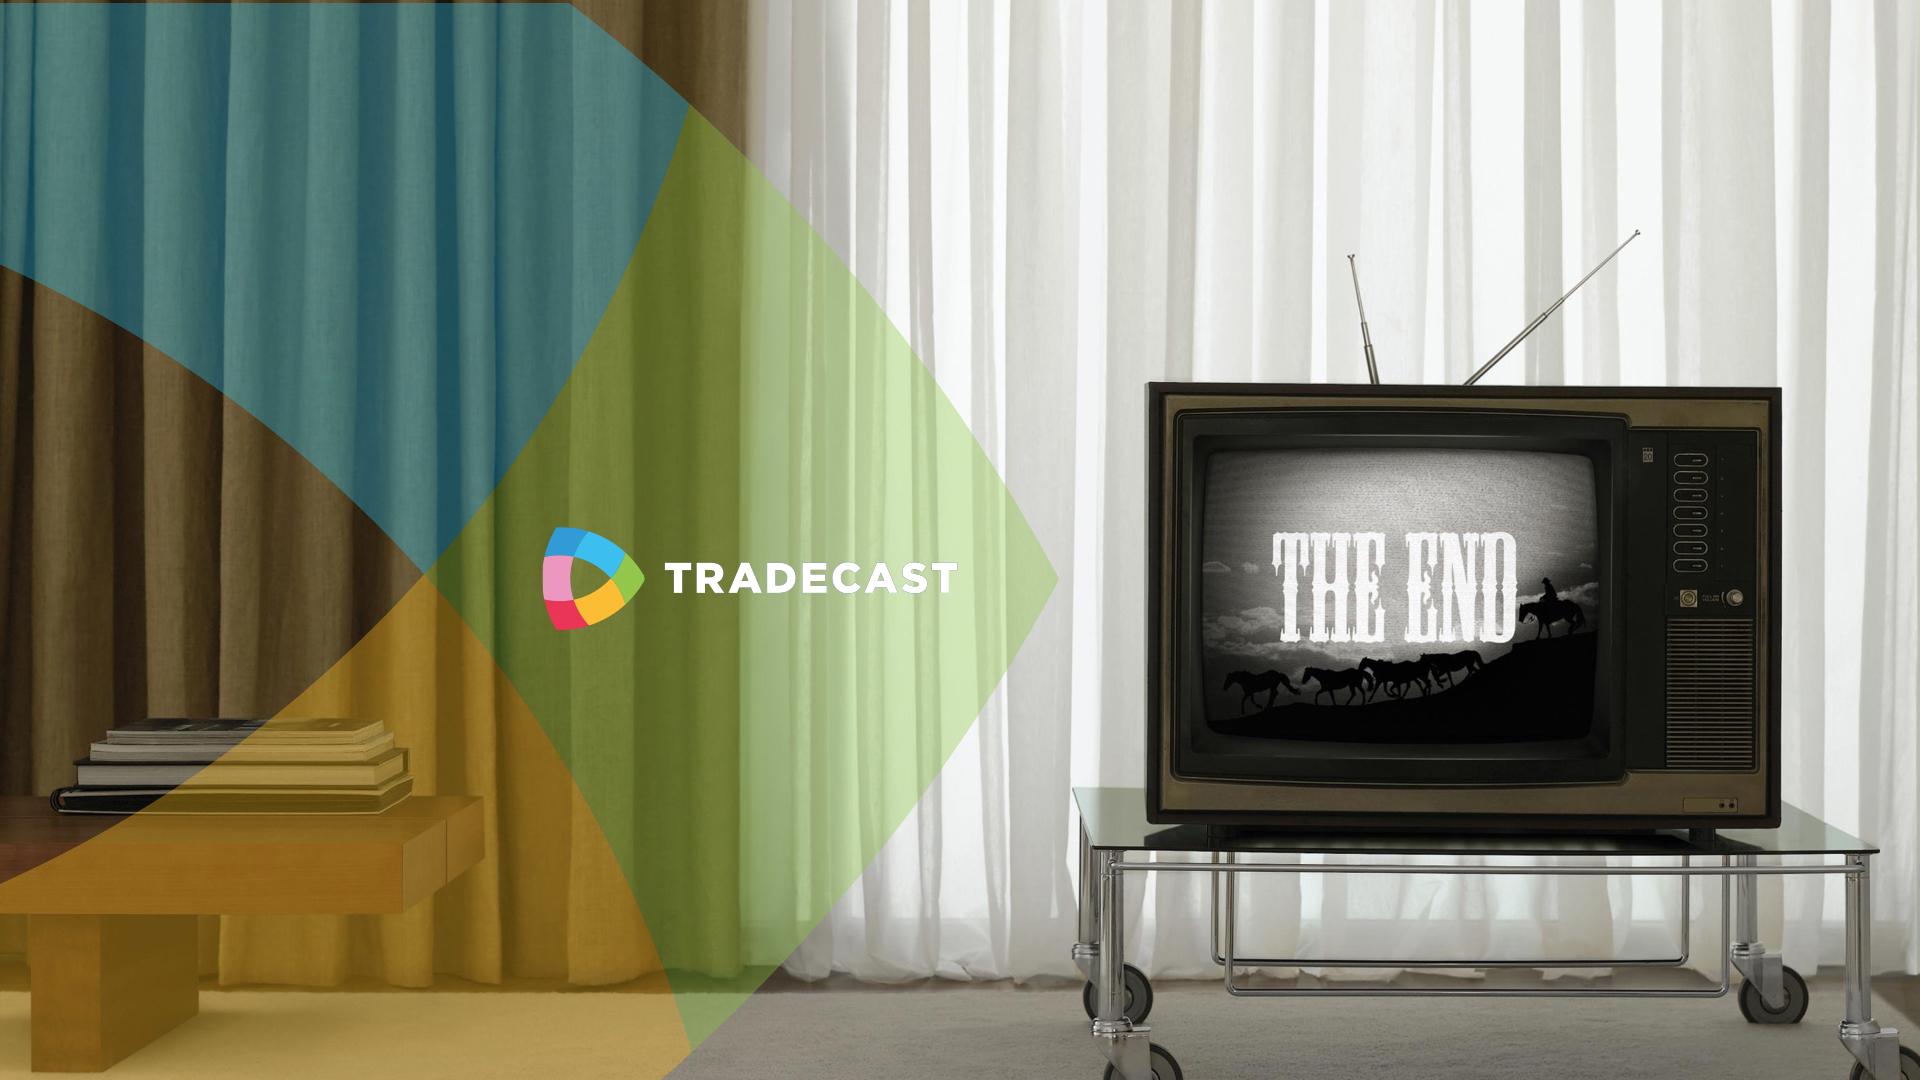 TradeCast turns 1!